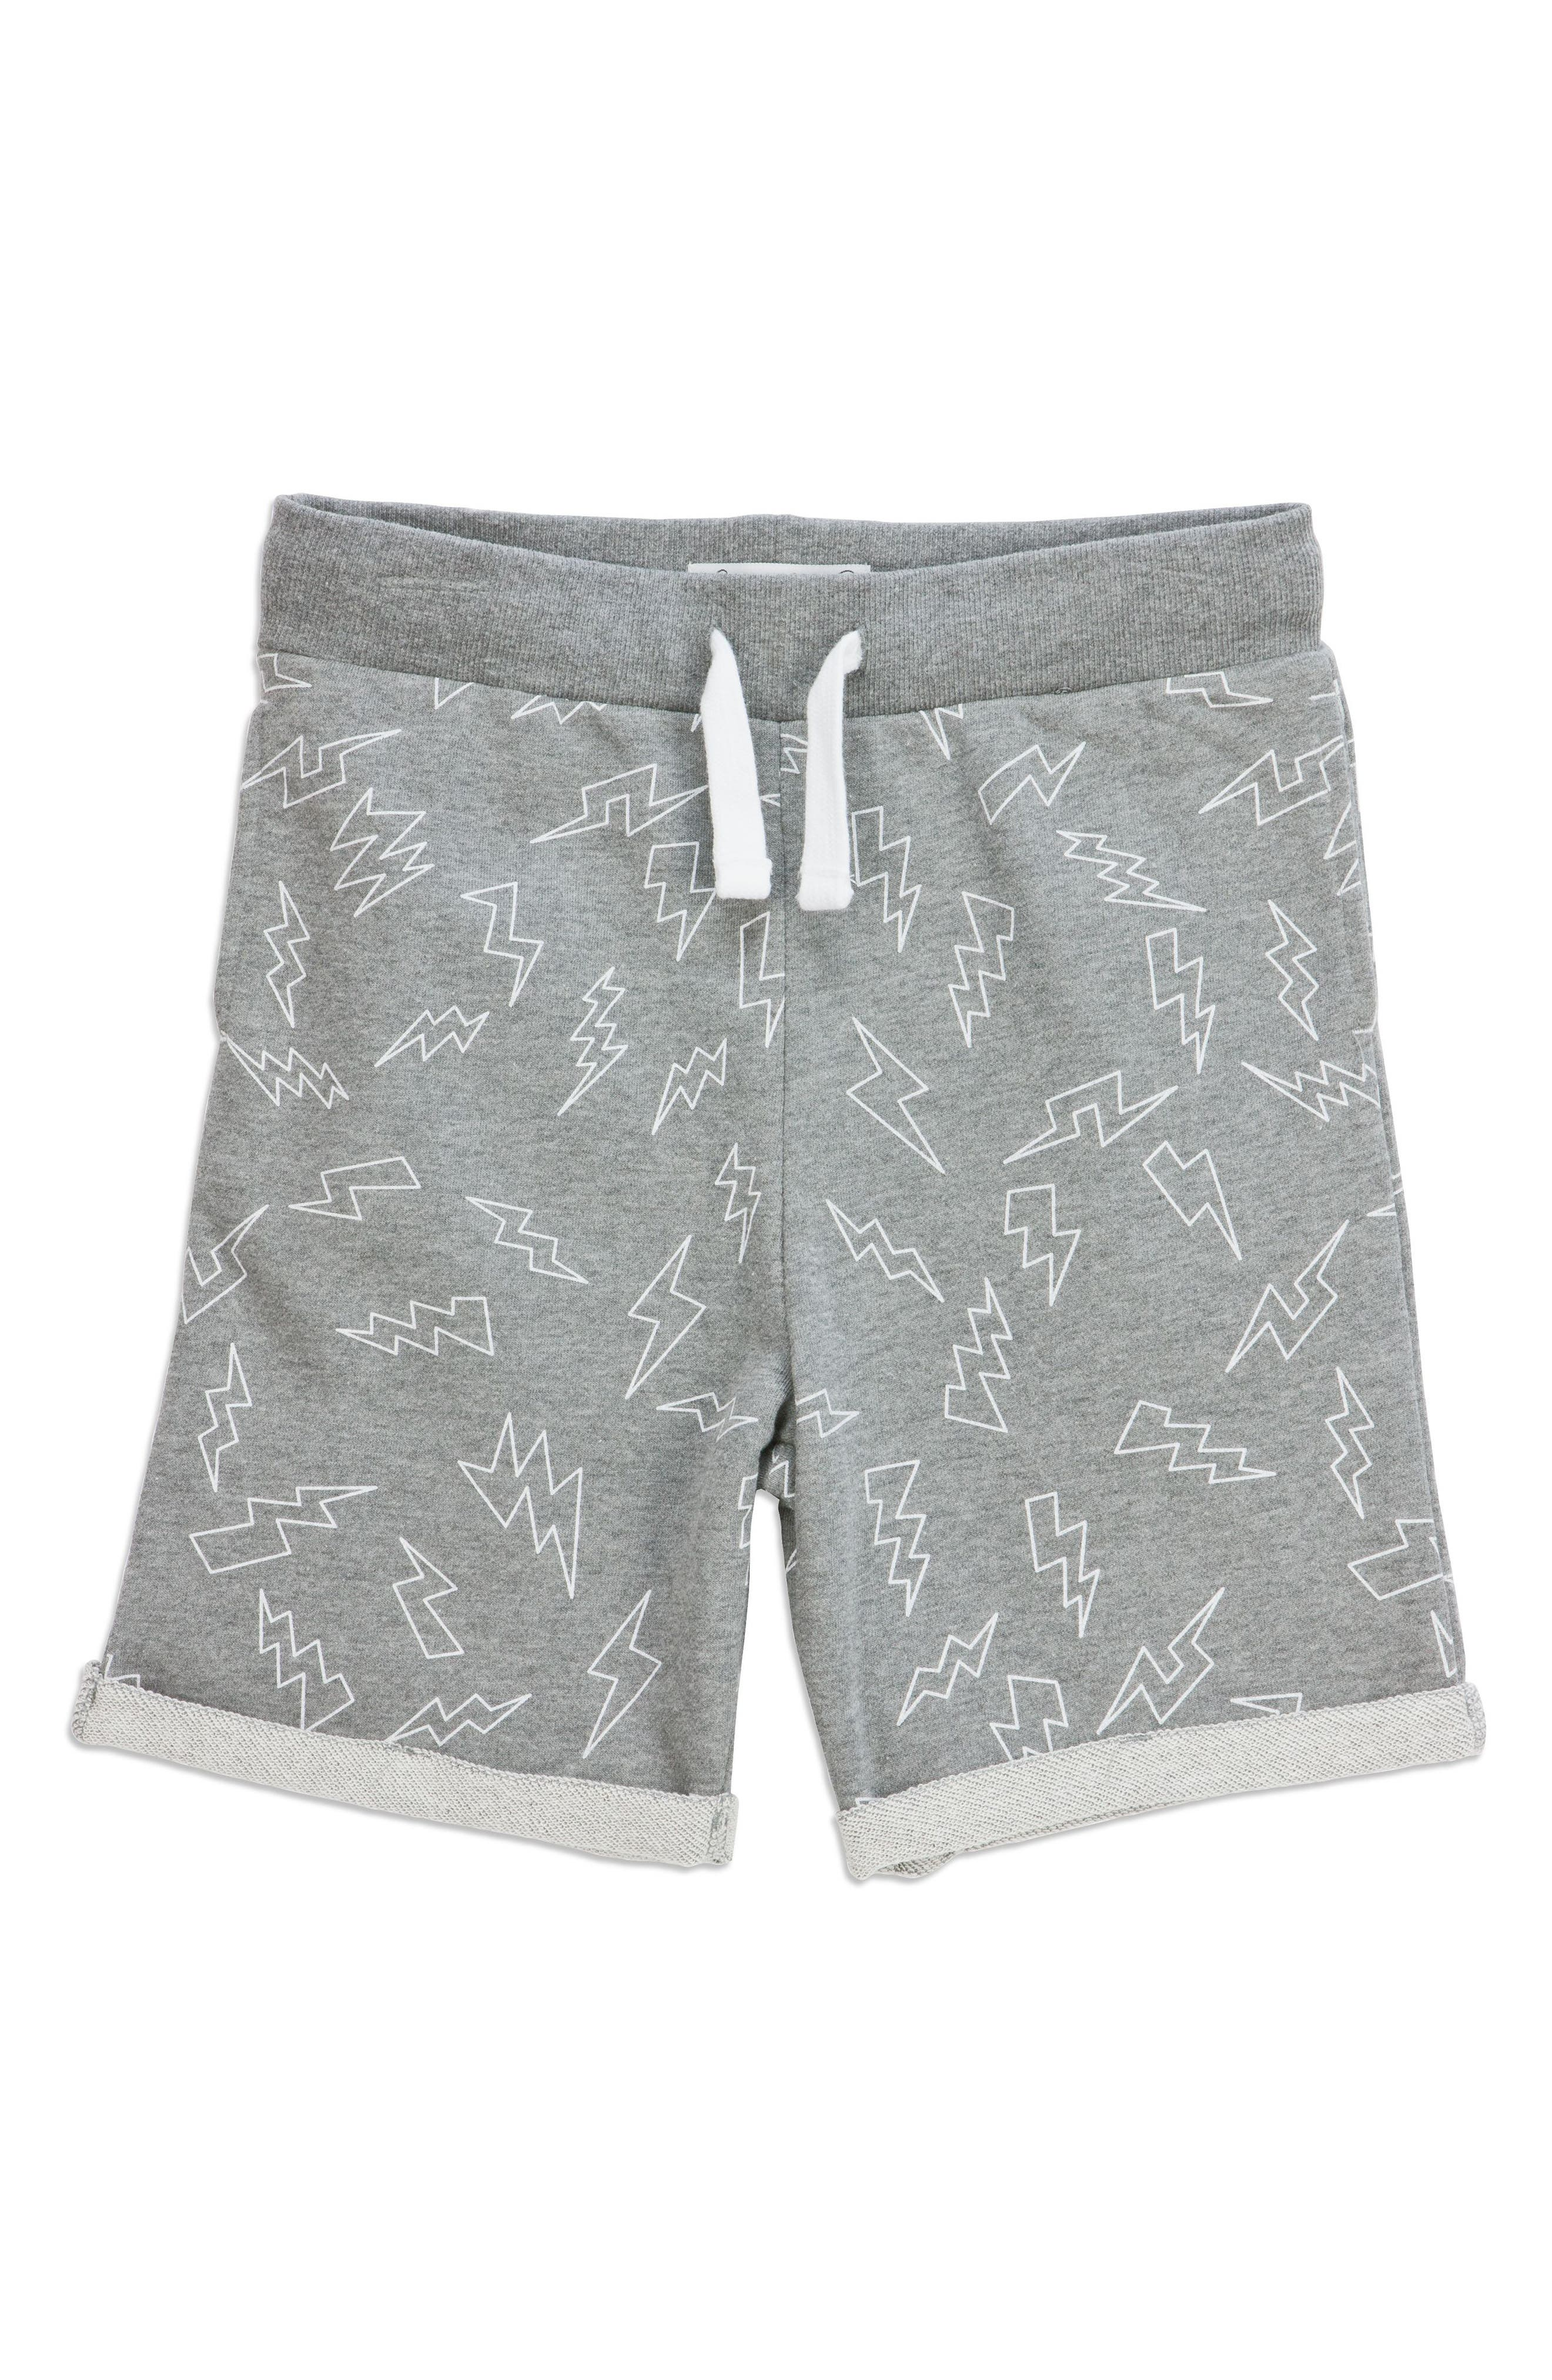 Electric Adriel Knit Shorts,                             Main thumbnail 1, color,                             020